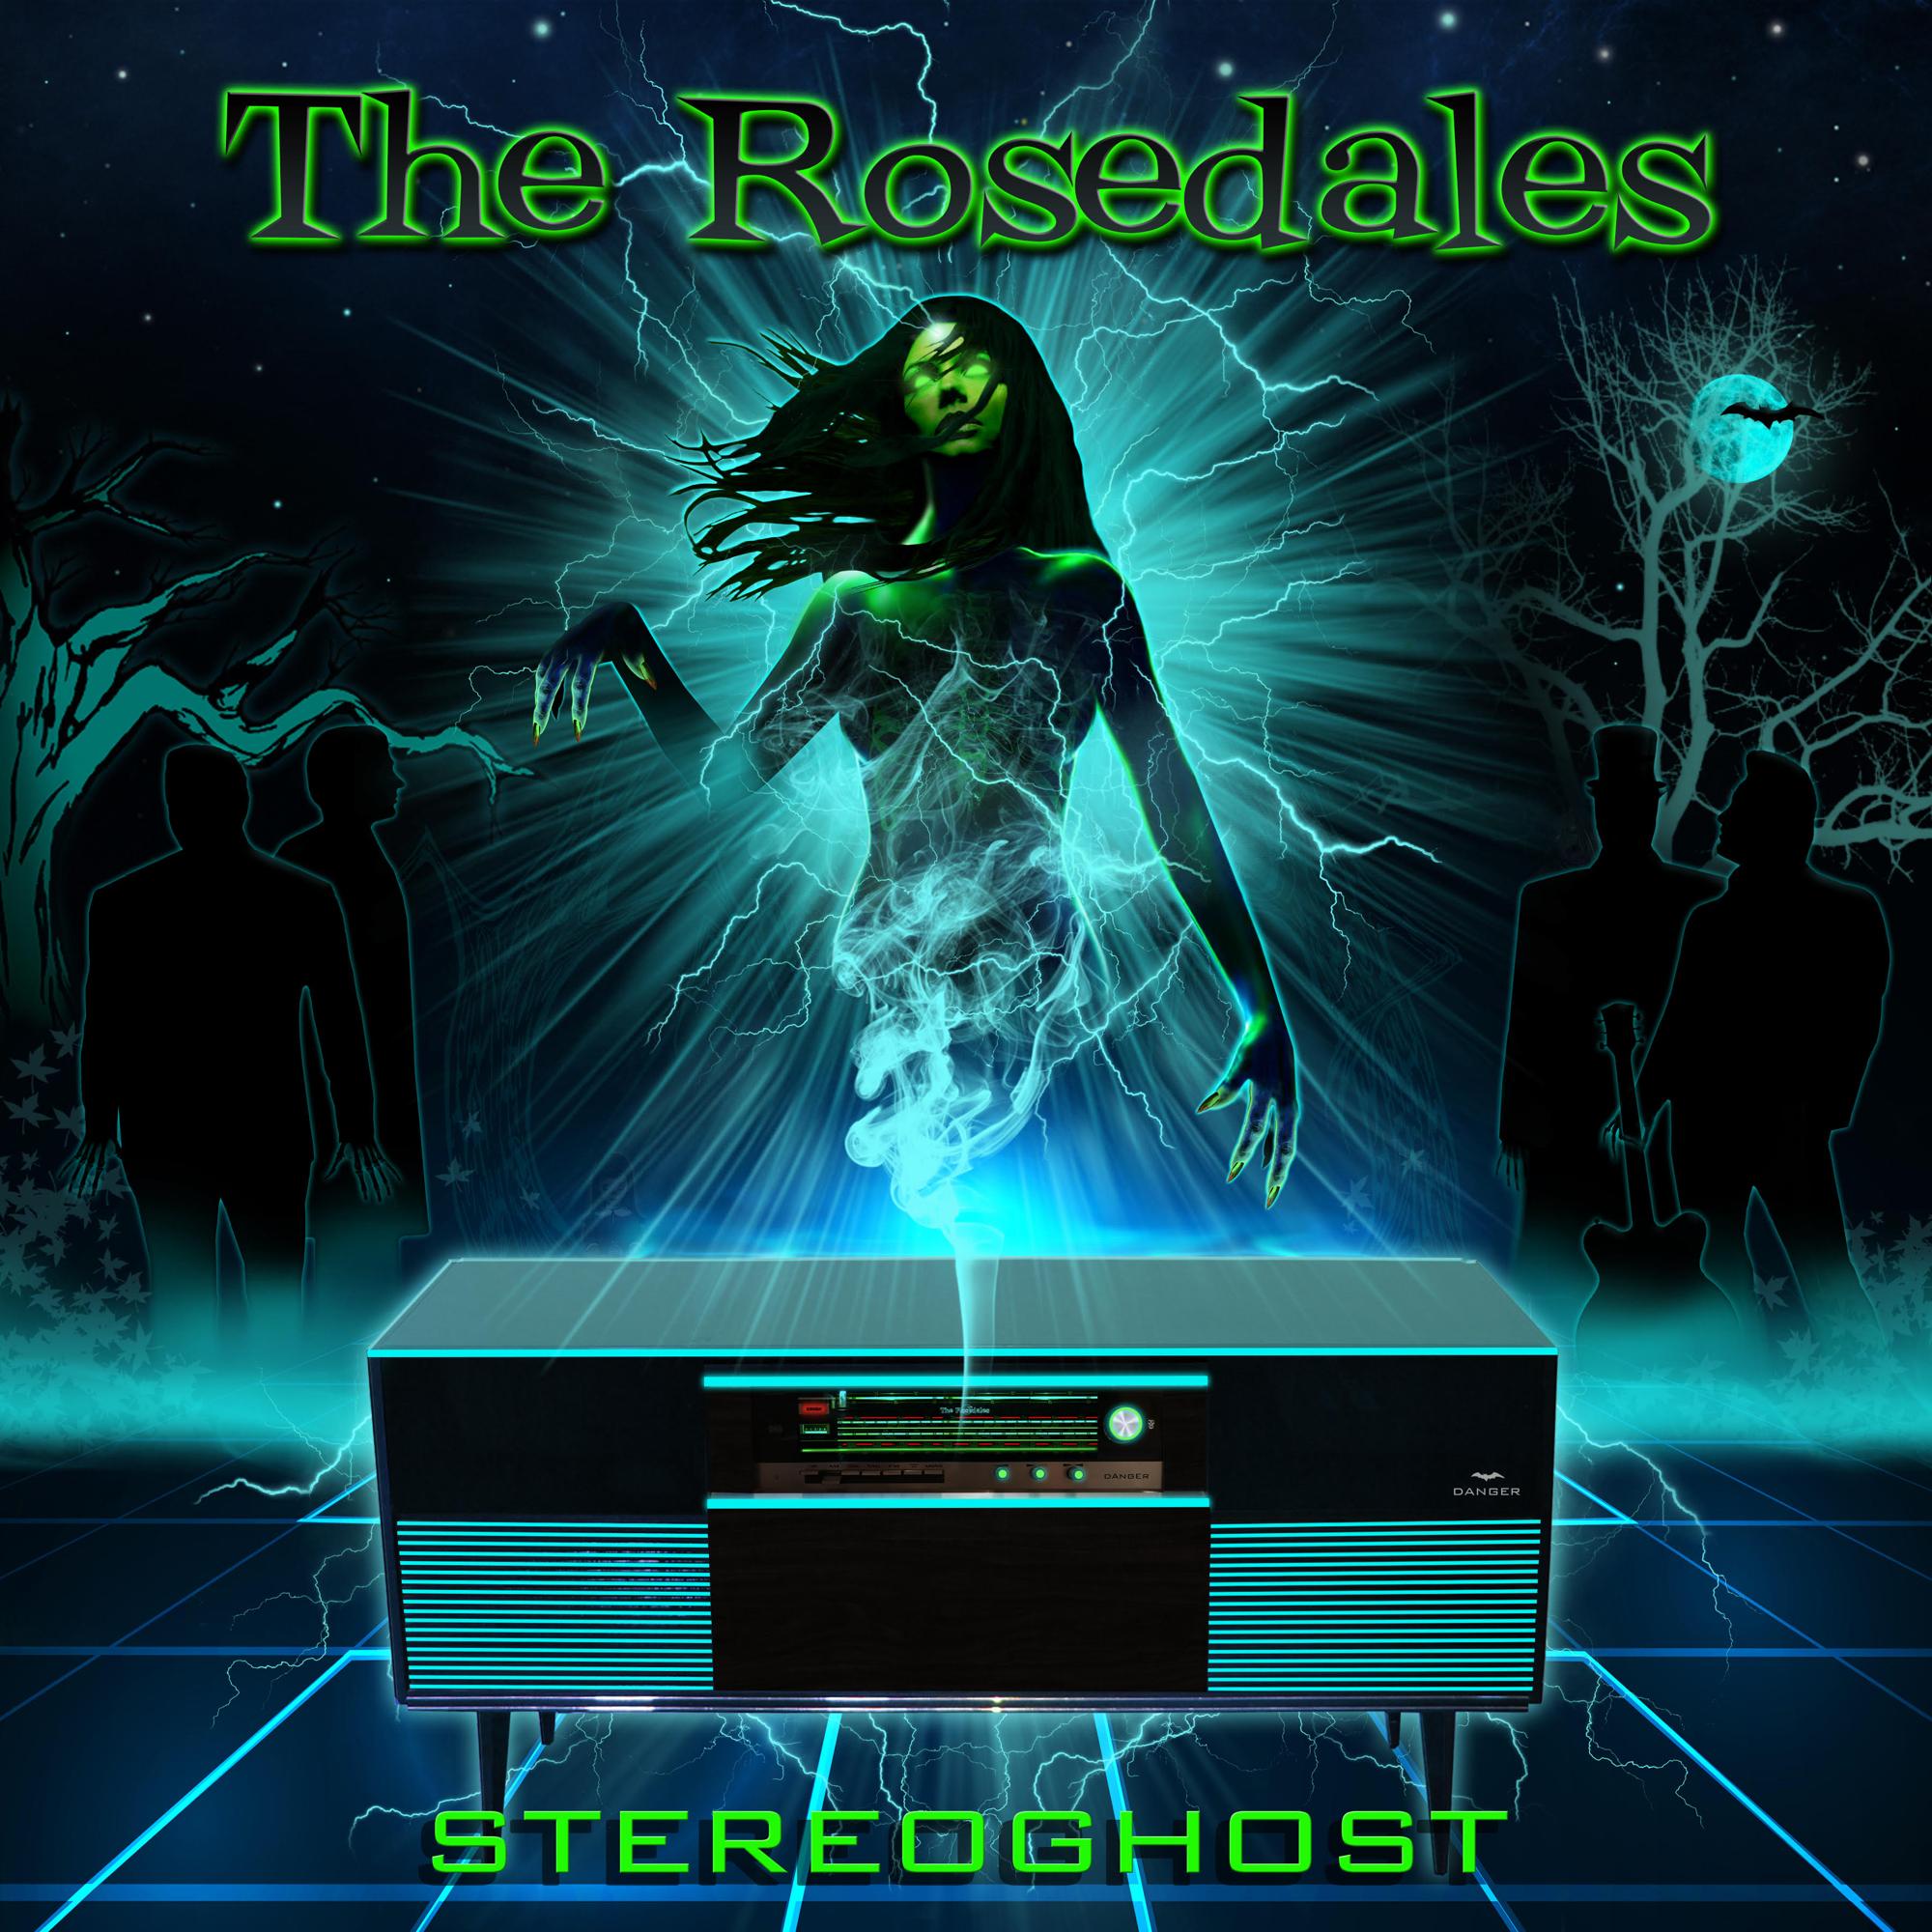 The Rosedales - Stereoghost CD 1  (190621073531|15.00.0.00)  [+Peso($43.00 c/100gr)] (IMP)